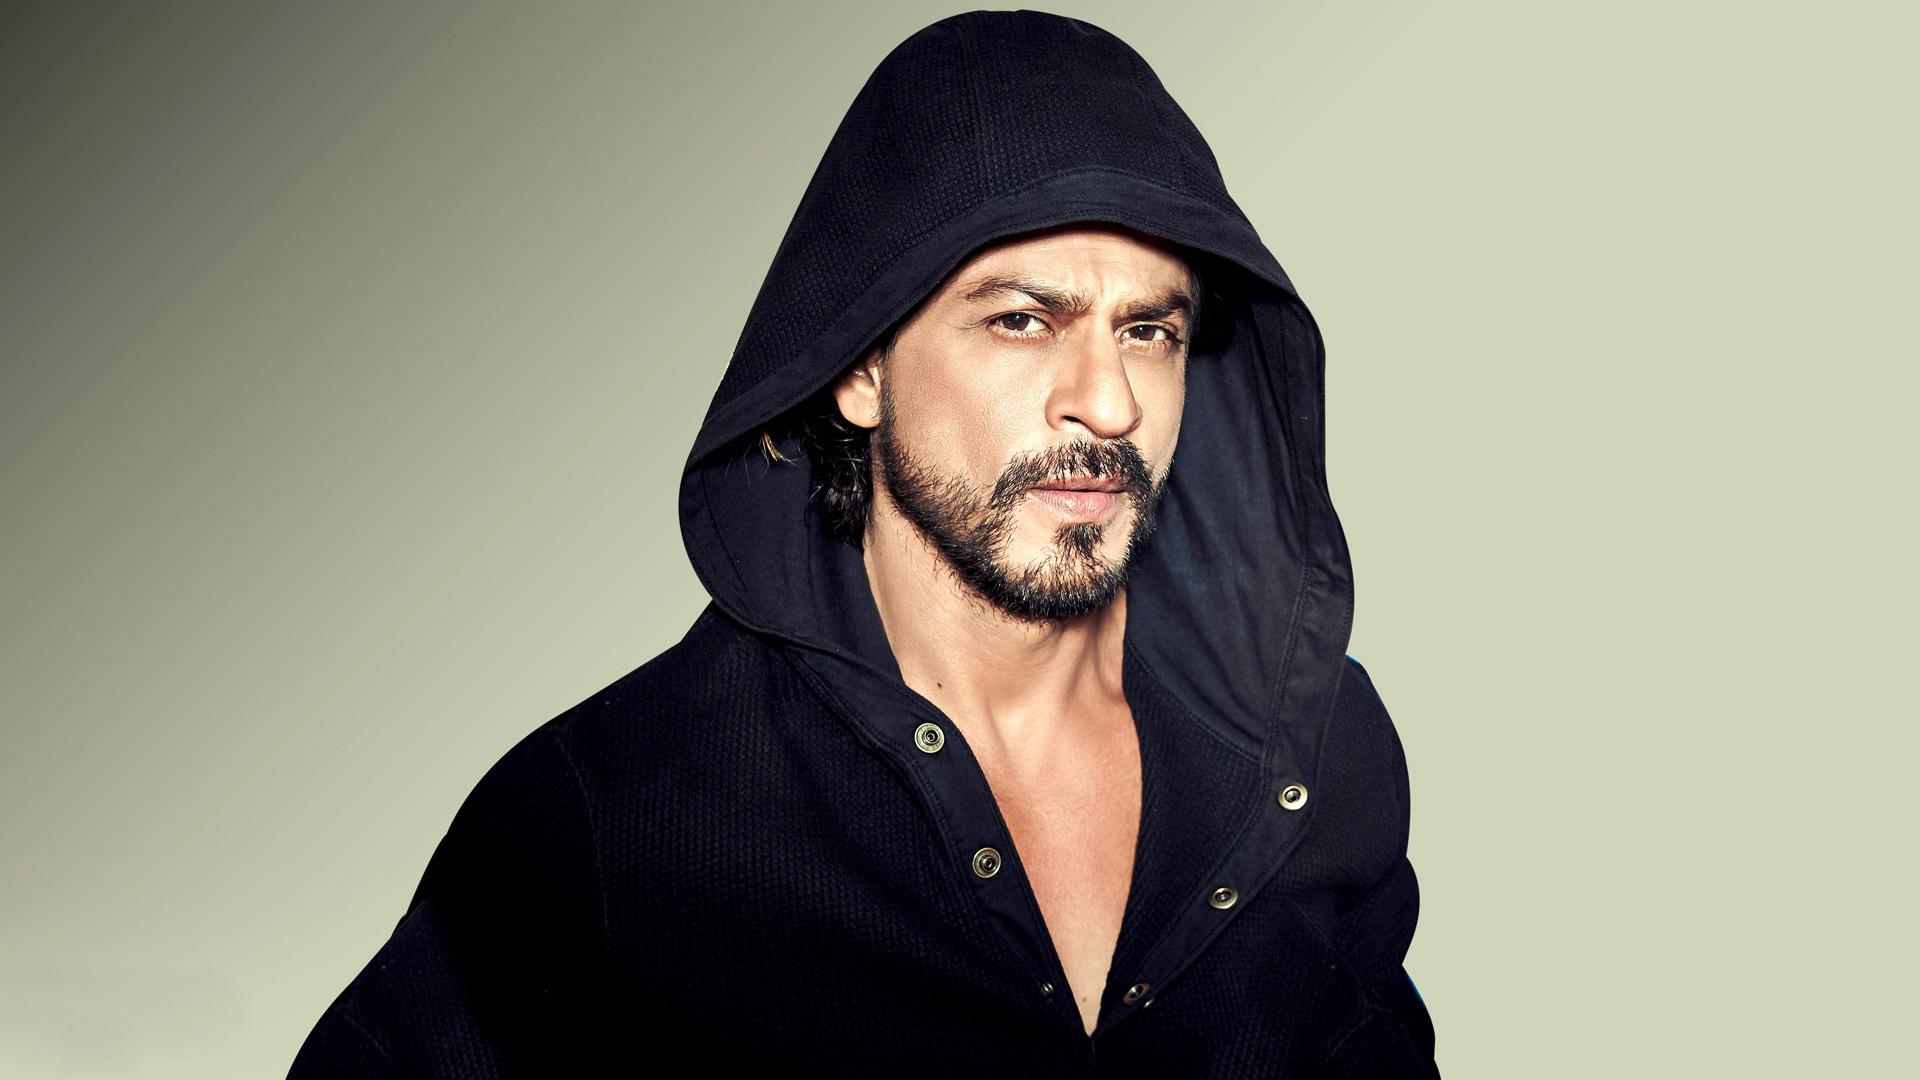 Shahrukh Khan s Wallpapers Pics Download